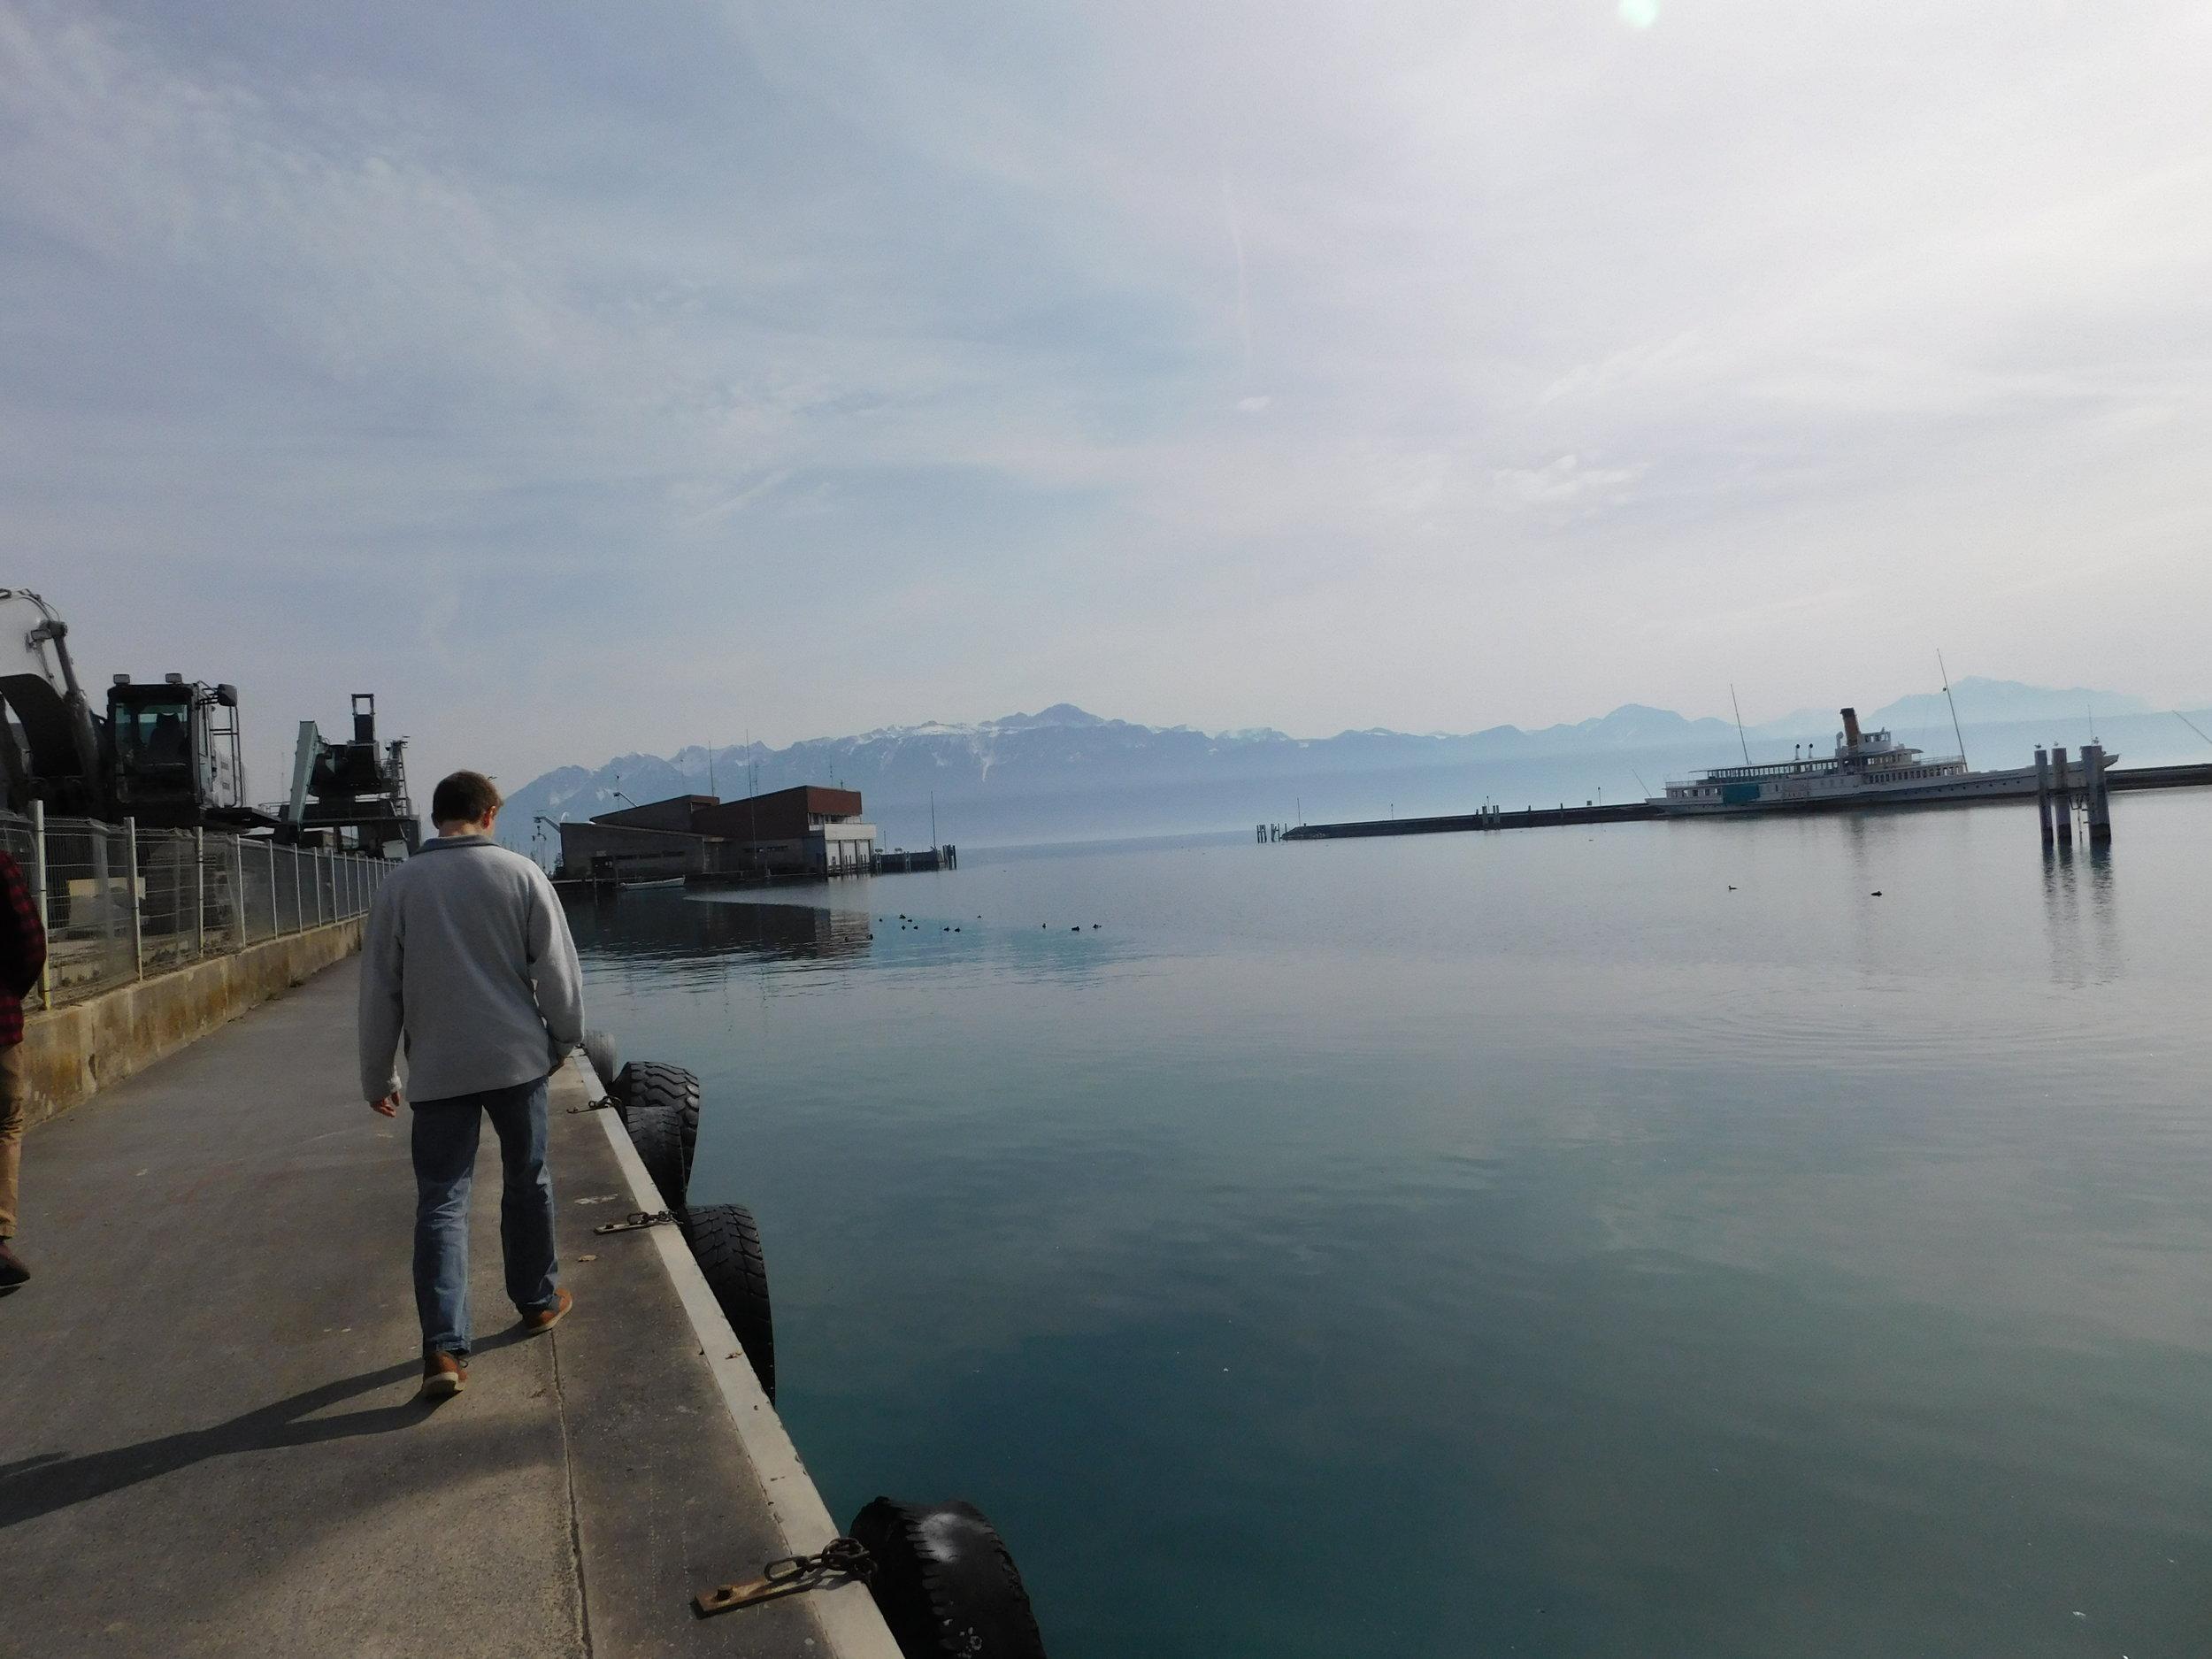 Seeing the harbor in Lausanne, Switzerland